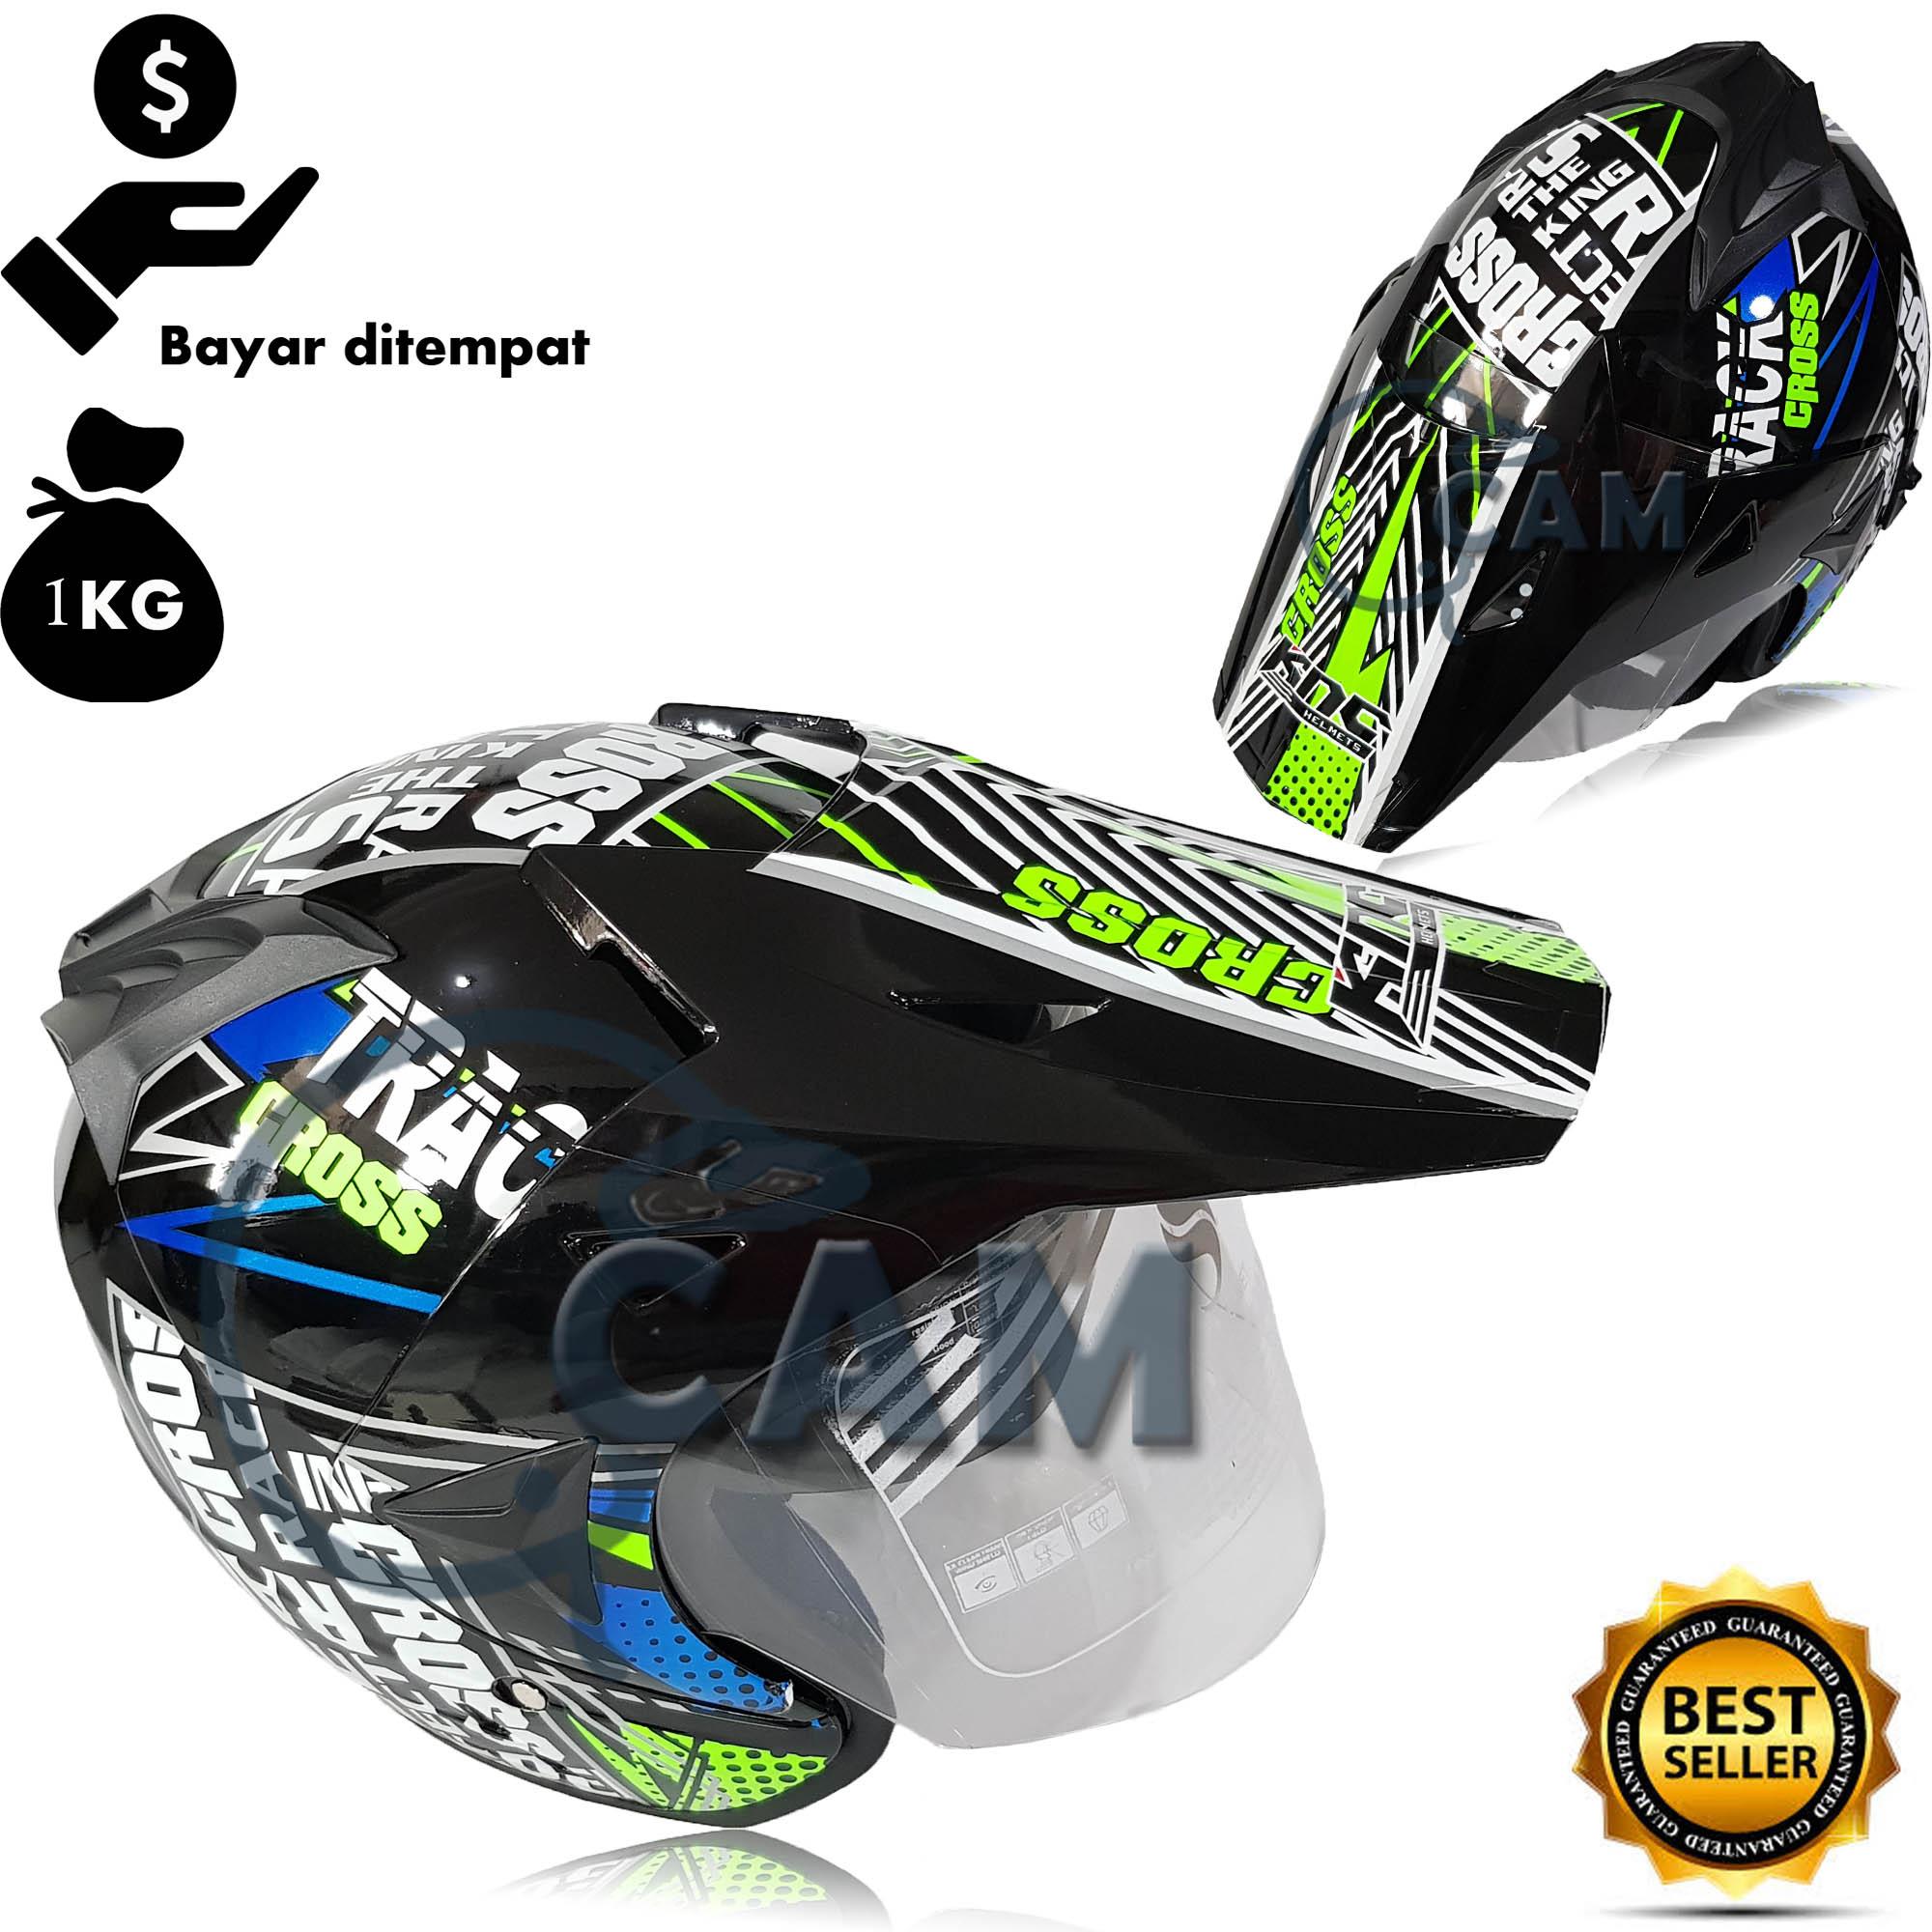 helm semi cross track black gloss bukan jpx ink nhk bxp